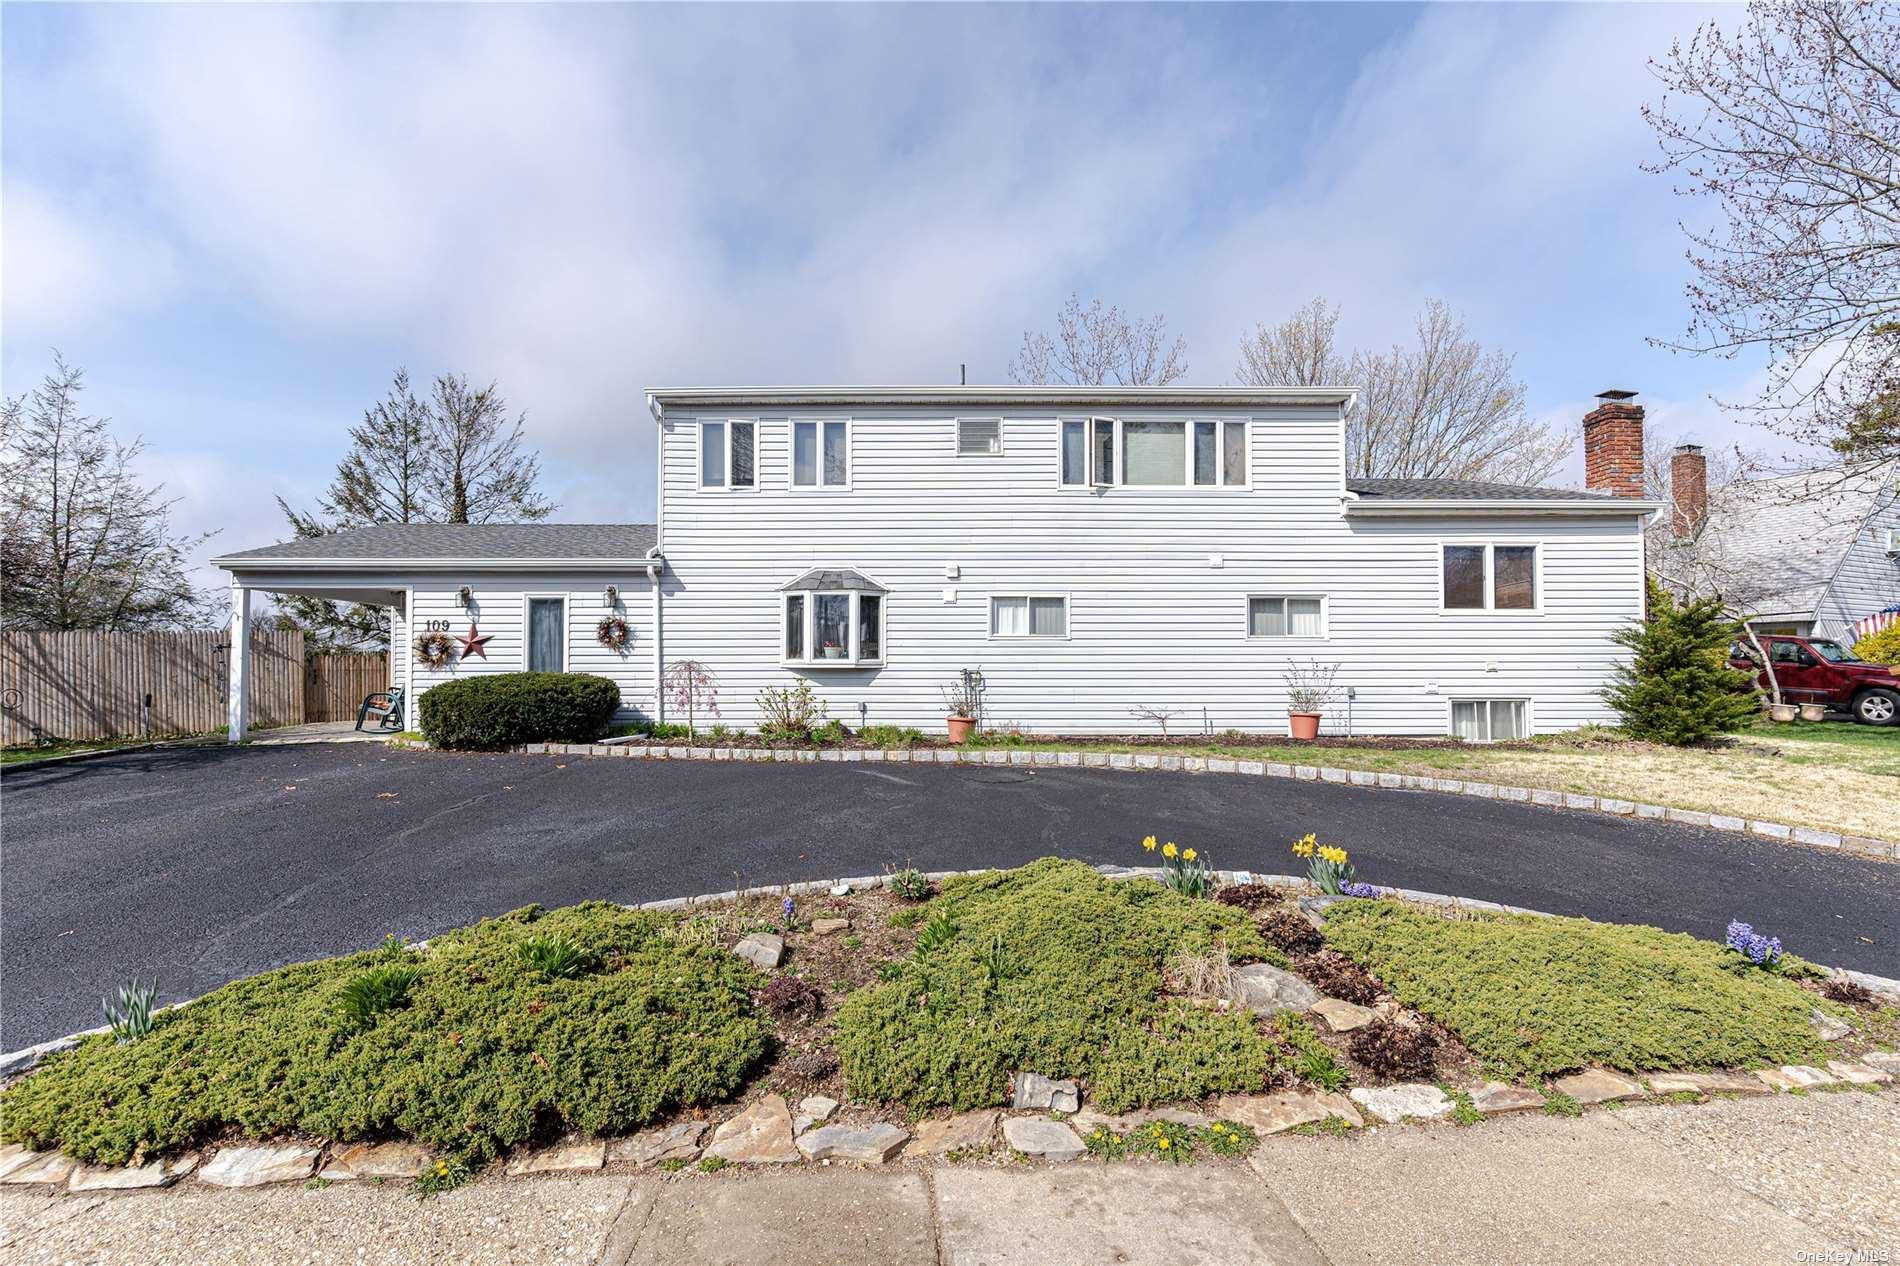 109 Land Lane, Westbury, NY 11590 - MLS#: 3303506